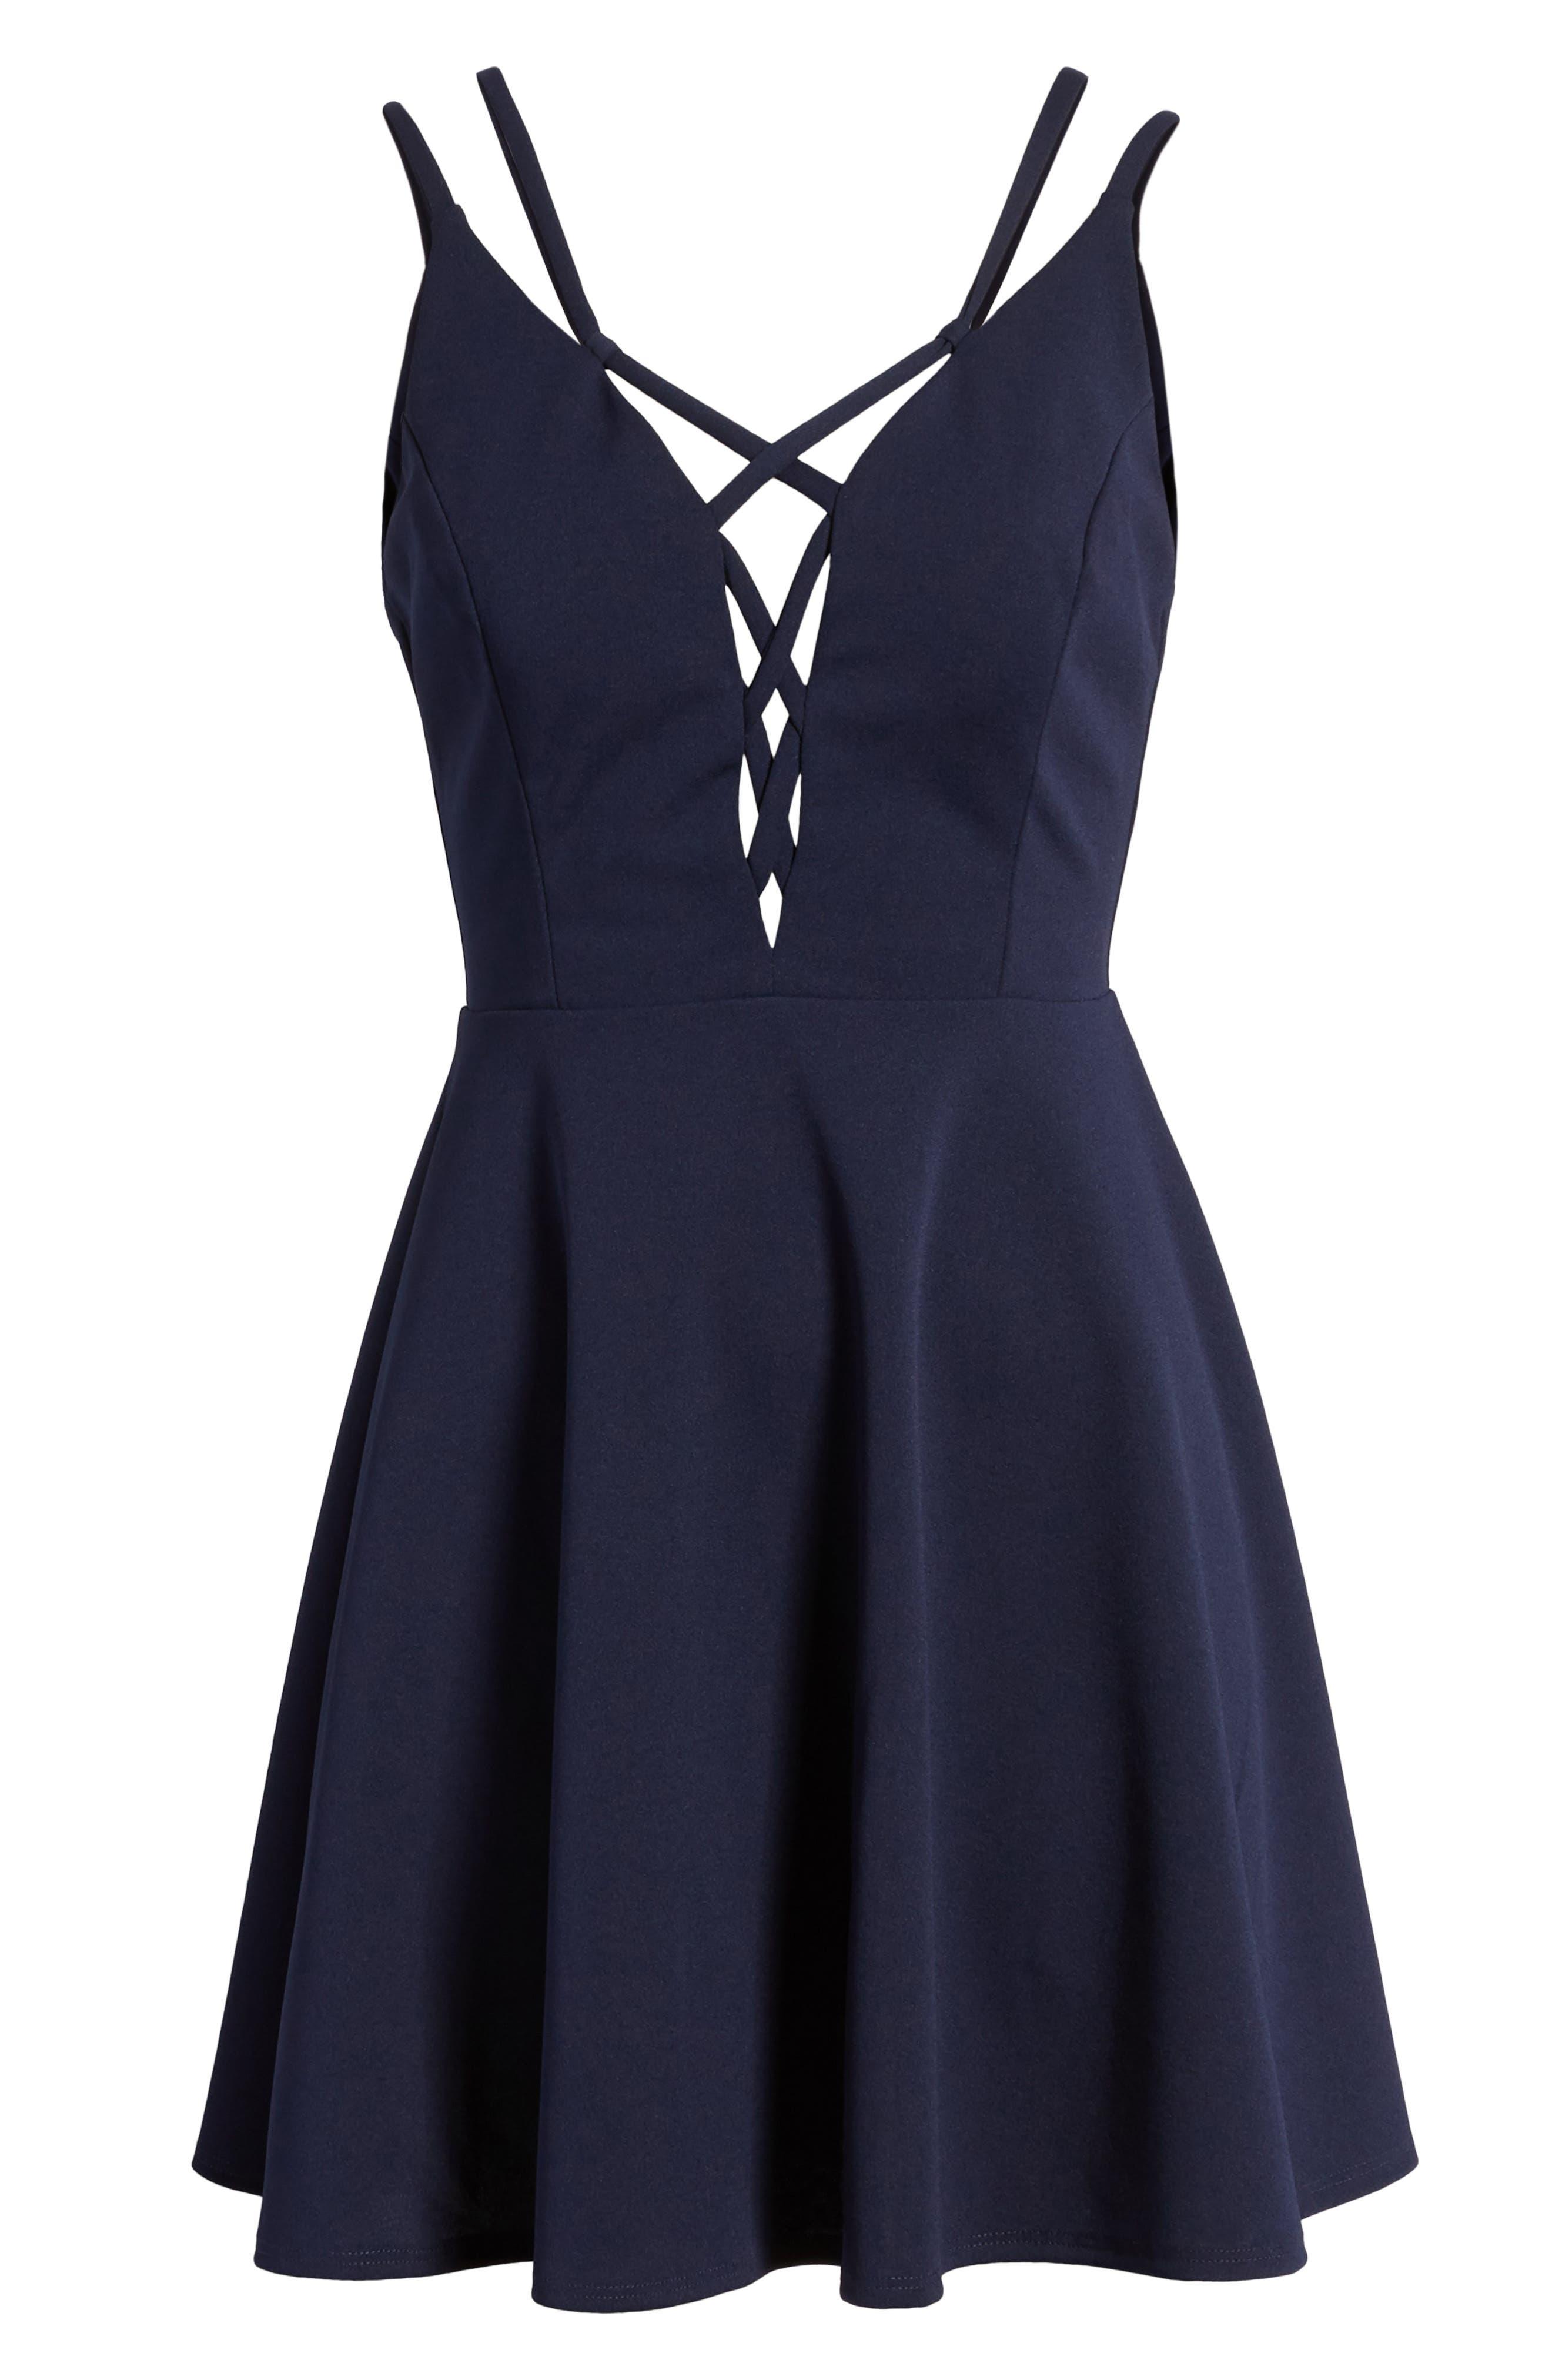 Lace-Up Skater Dress,                             Alternate thumbnail 7, color,                             407